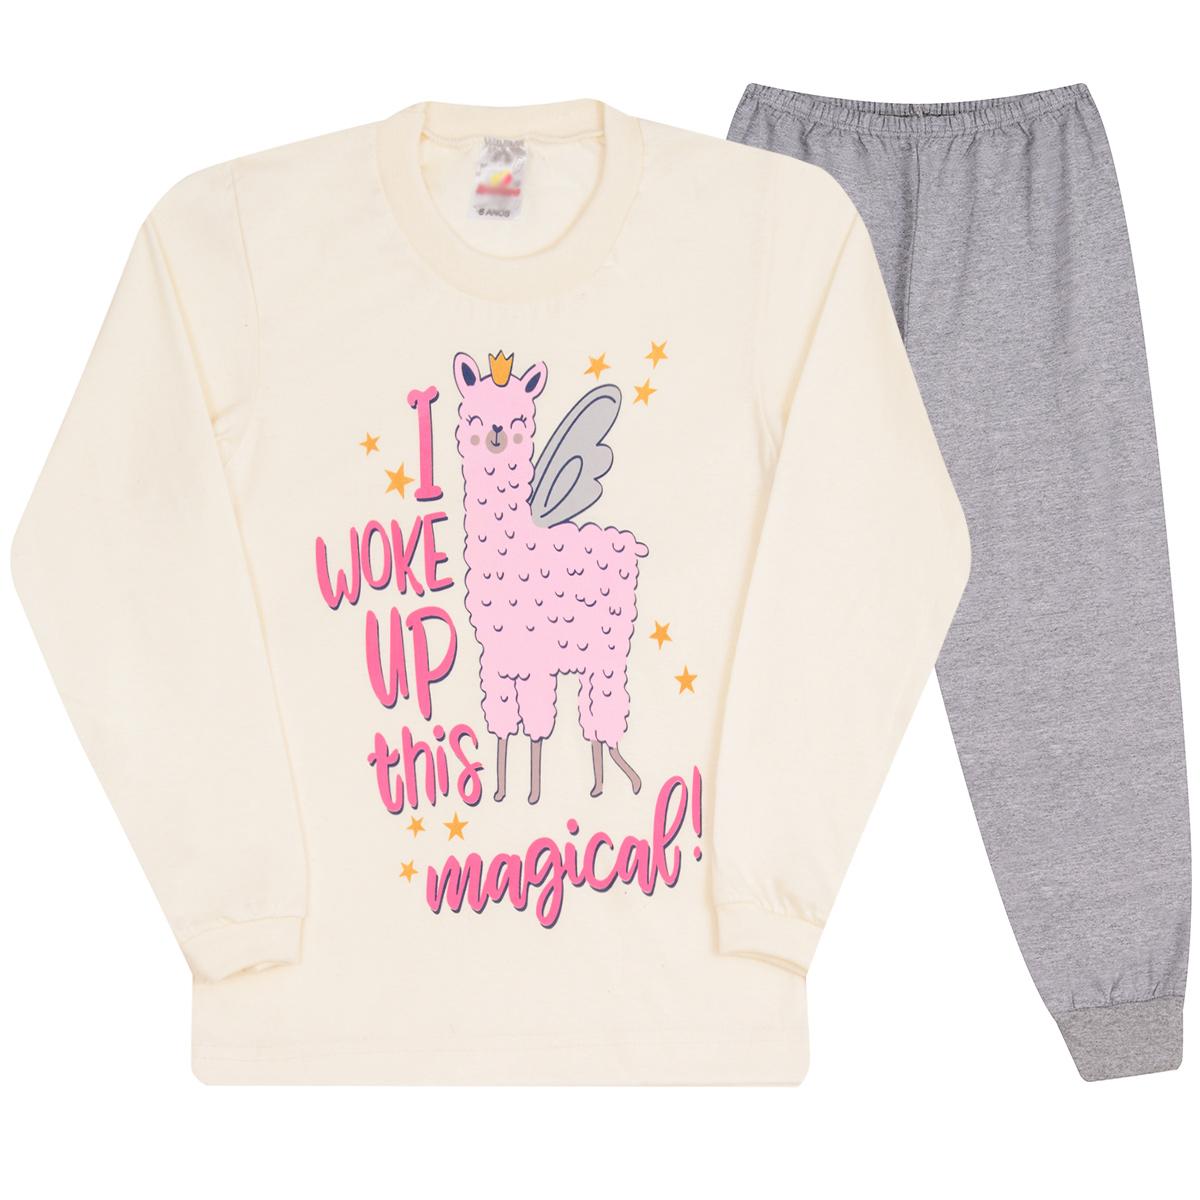 Pijama Infantil Menina Estampado Manga Longa Calça Inverno